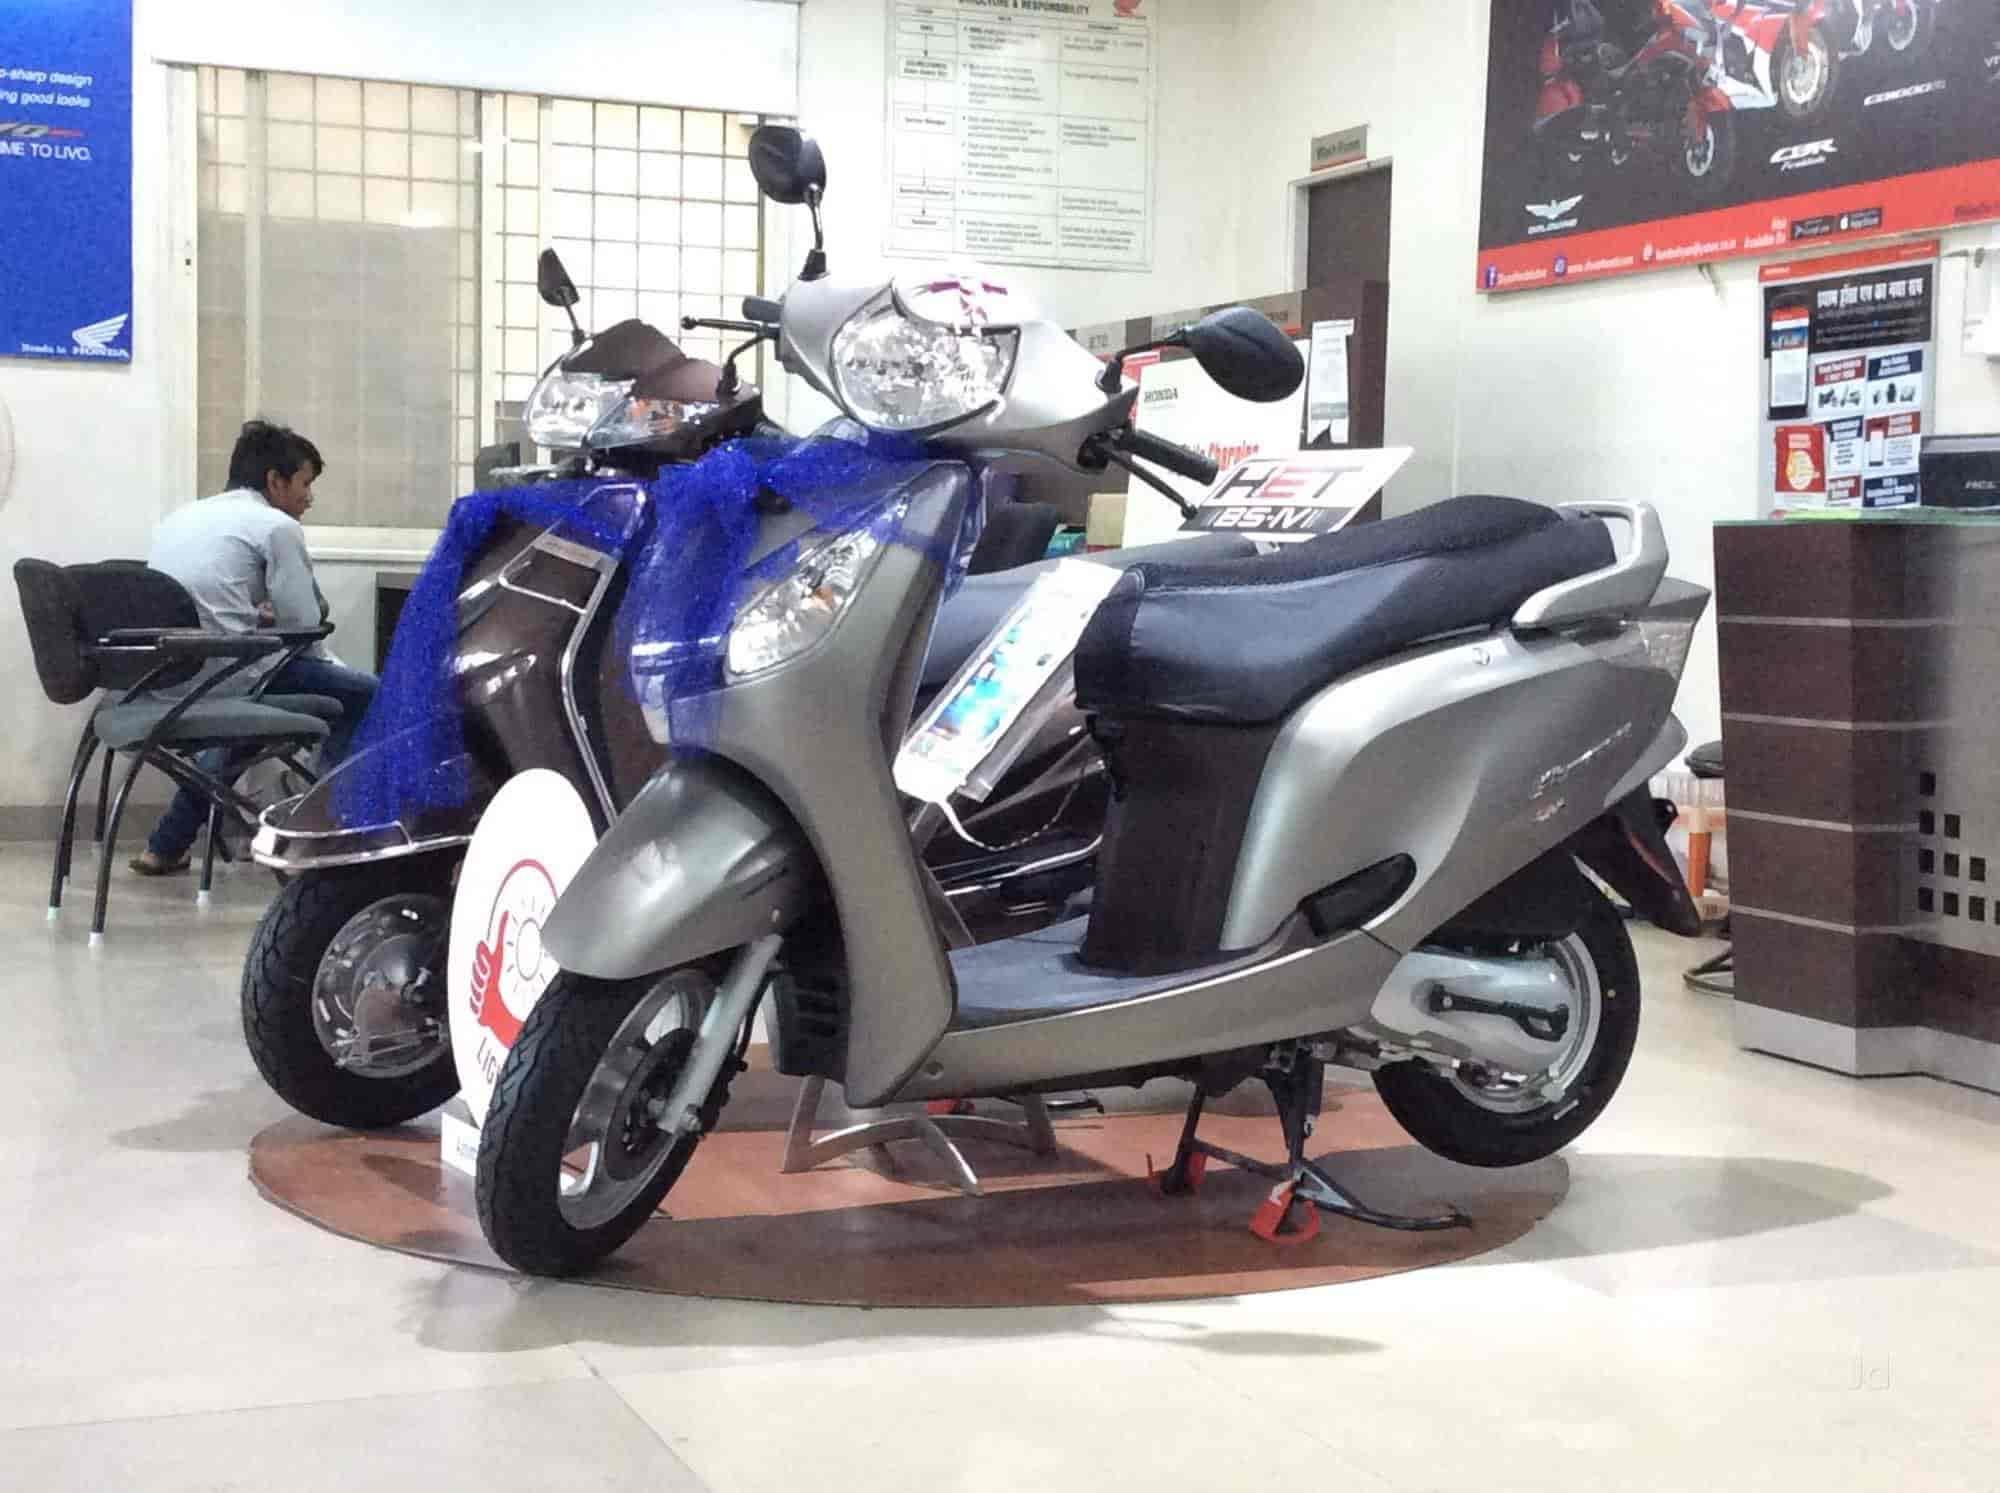 Motorcycle Dealer Near Me >> Top Honda Cb Unicorn Motorcycle Dealers In Sapna Sangeeta